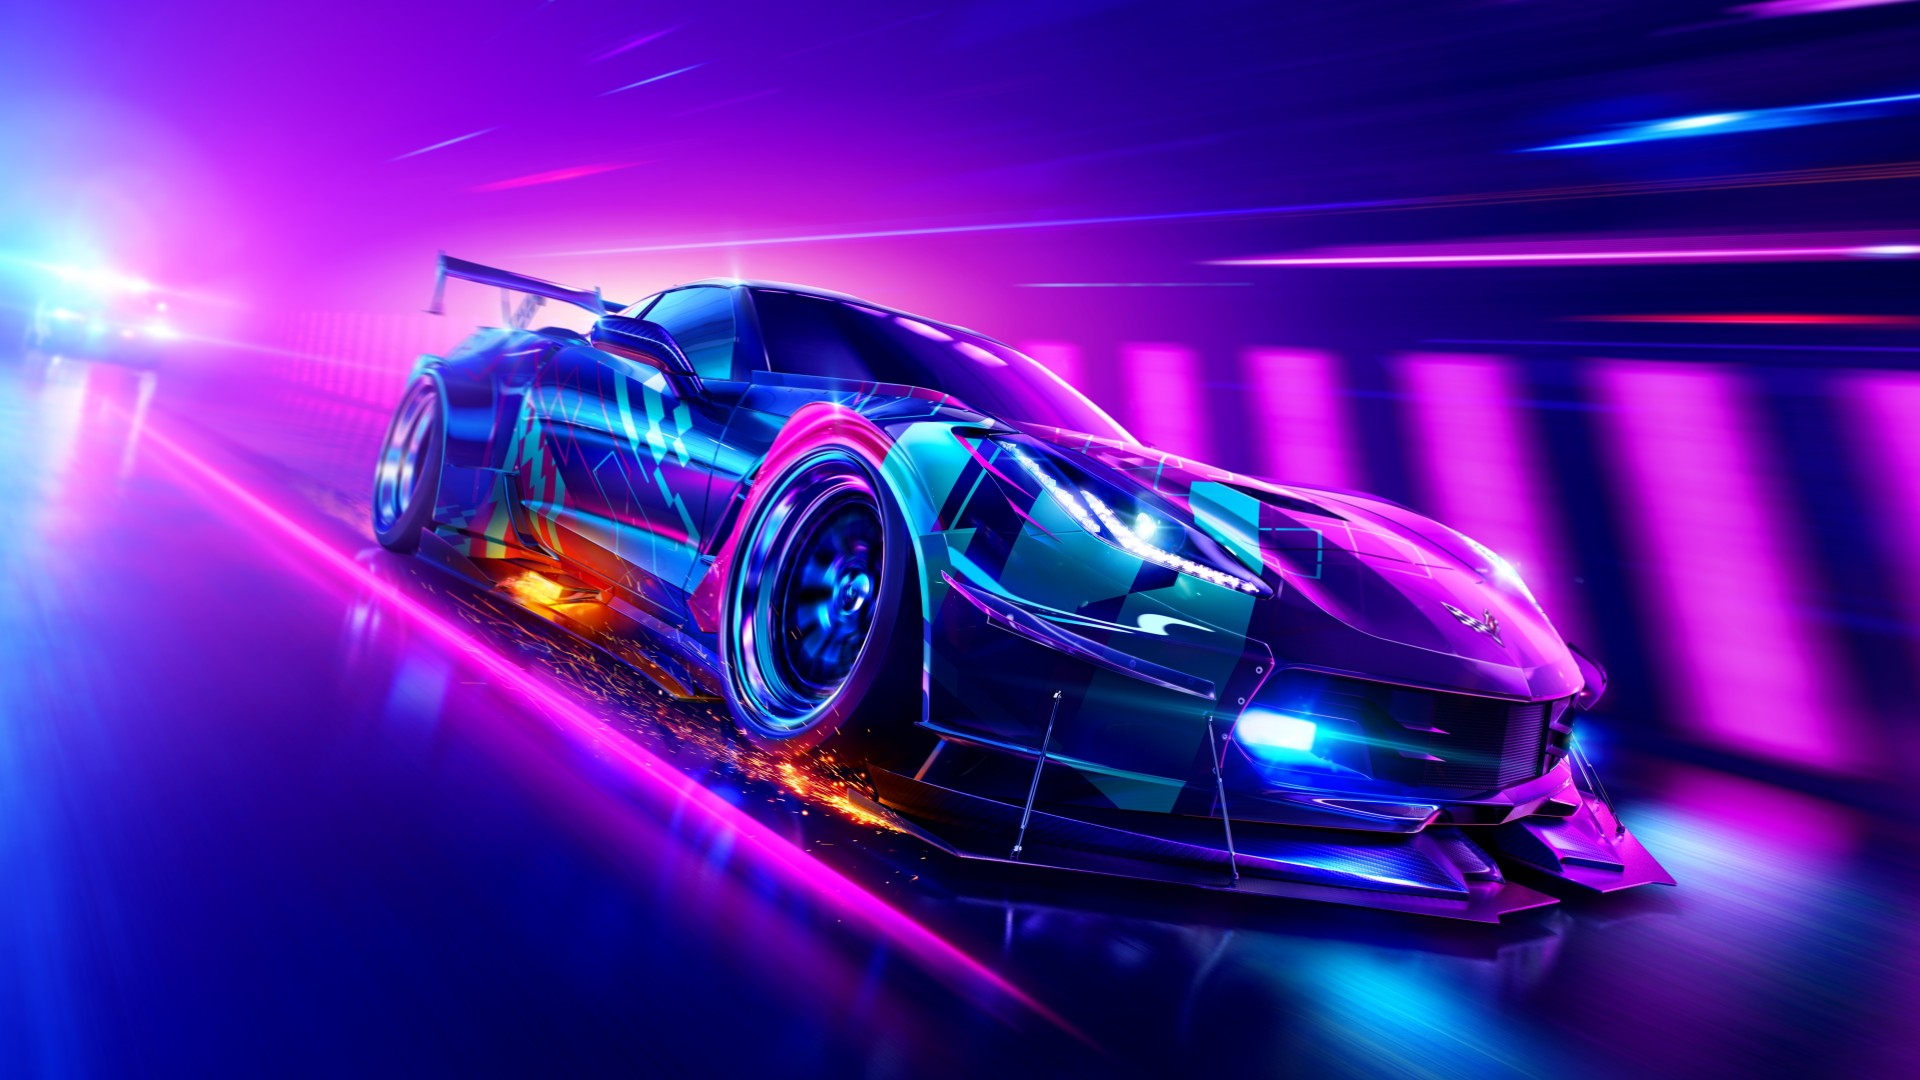 Lincoln Wallpaper Car Chevrolet Corvette Grand Sport In Need For Speed Heat